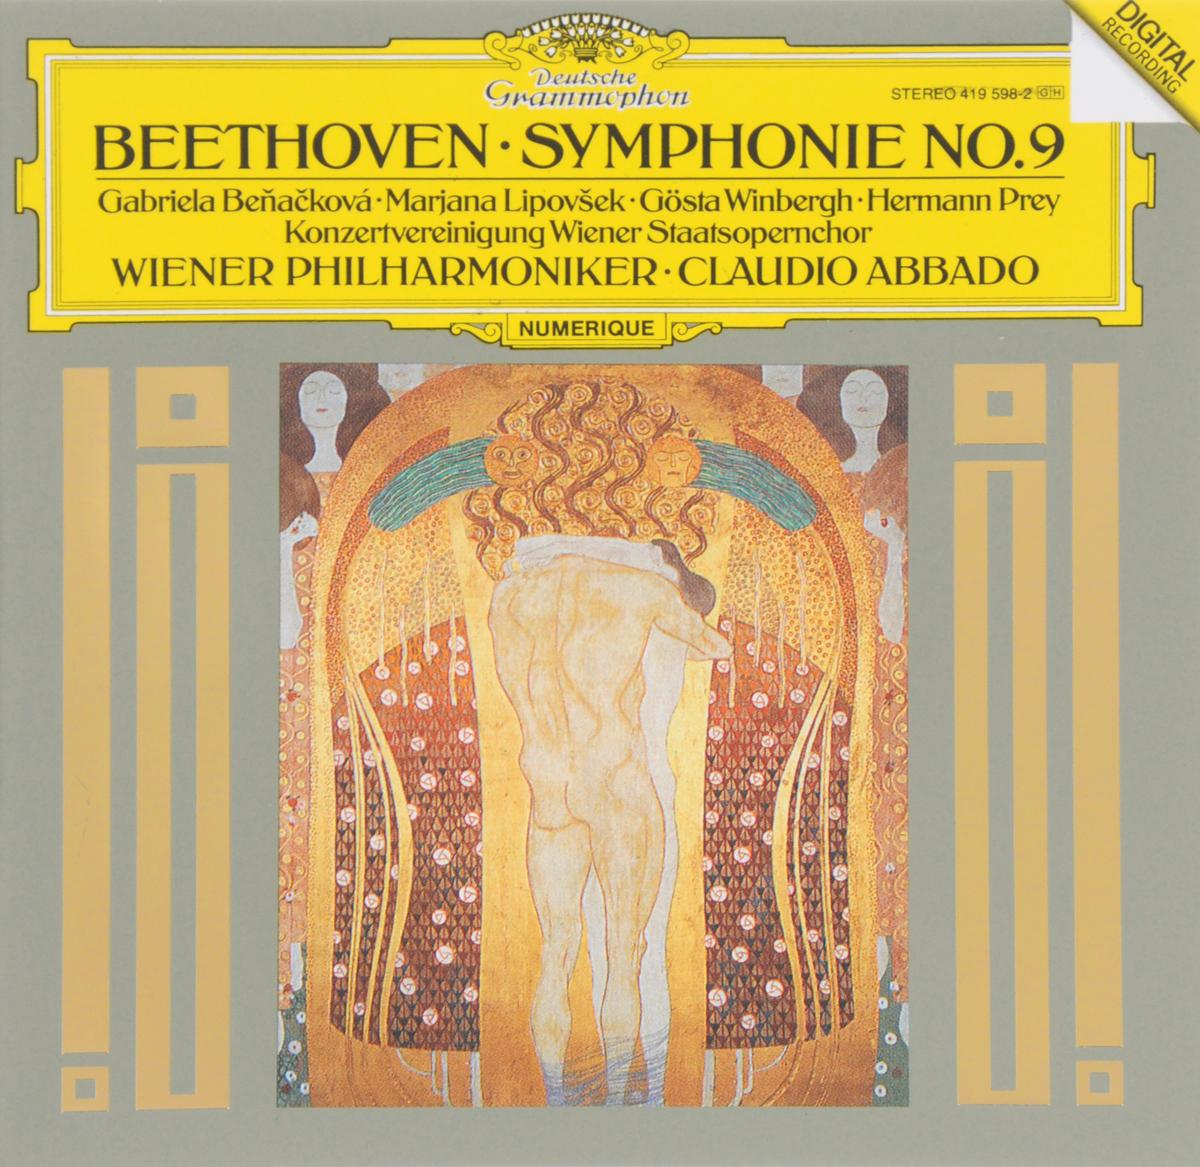 Клаудио Аббадо,Wiener Philharmoniker Claudio Abbado, Wiener Philharmoniker. Beethoven. Symphonie No. 9 münchner philharmoniker elbphilharmonie hamburg